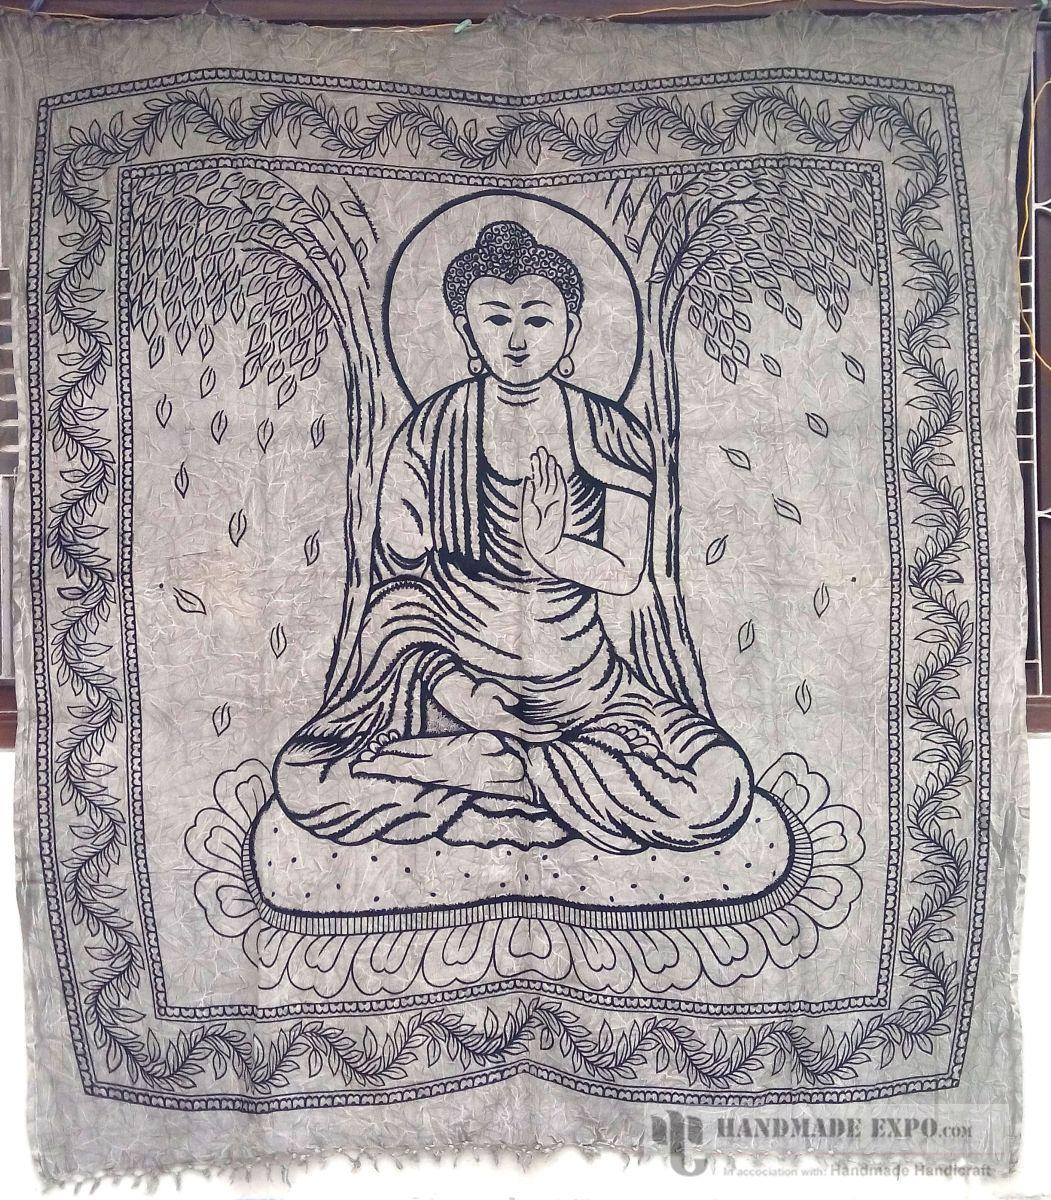 Handmade bed sheets design - Blessing Buddha Design Bed Sheet Handmade Handicraft Bed Sheets Bed Sheets Blessing Buddha Design Bed Sheet Cotton